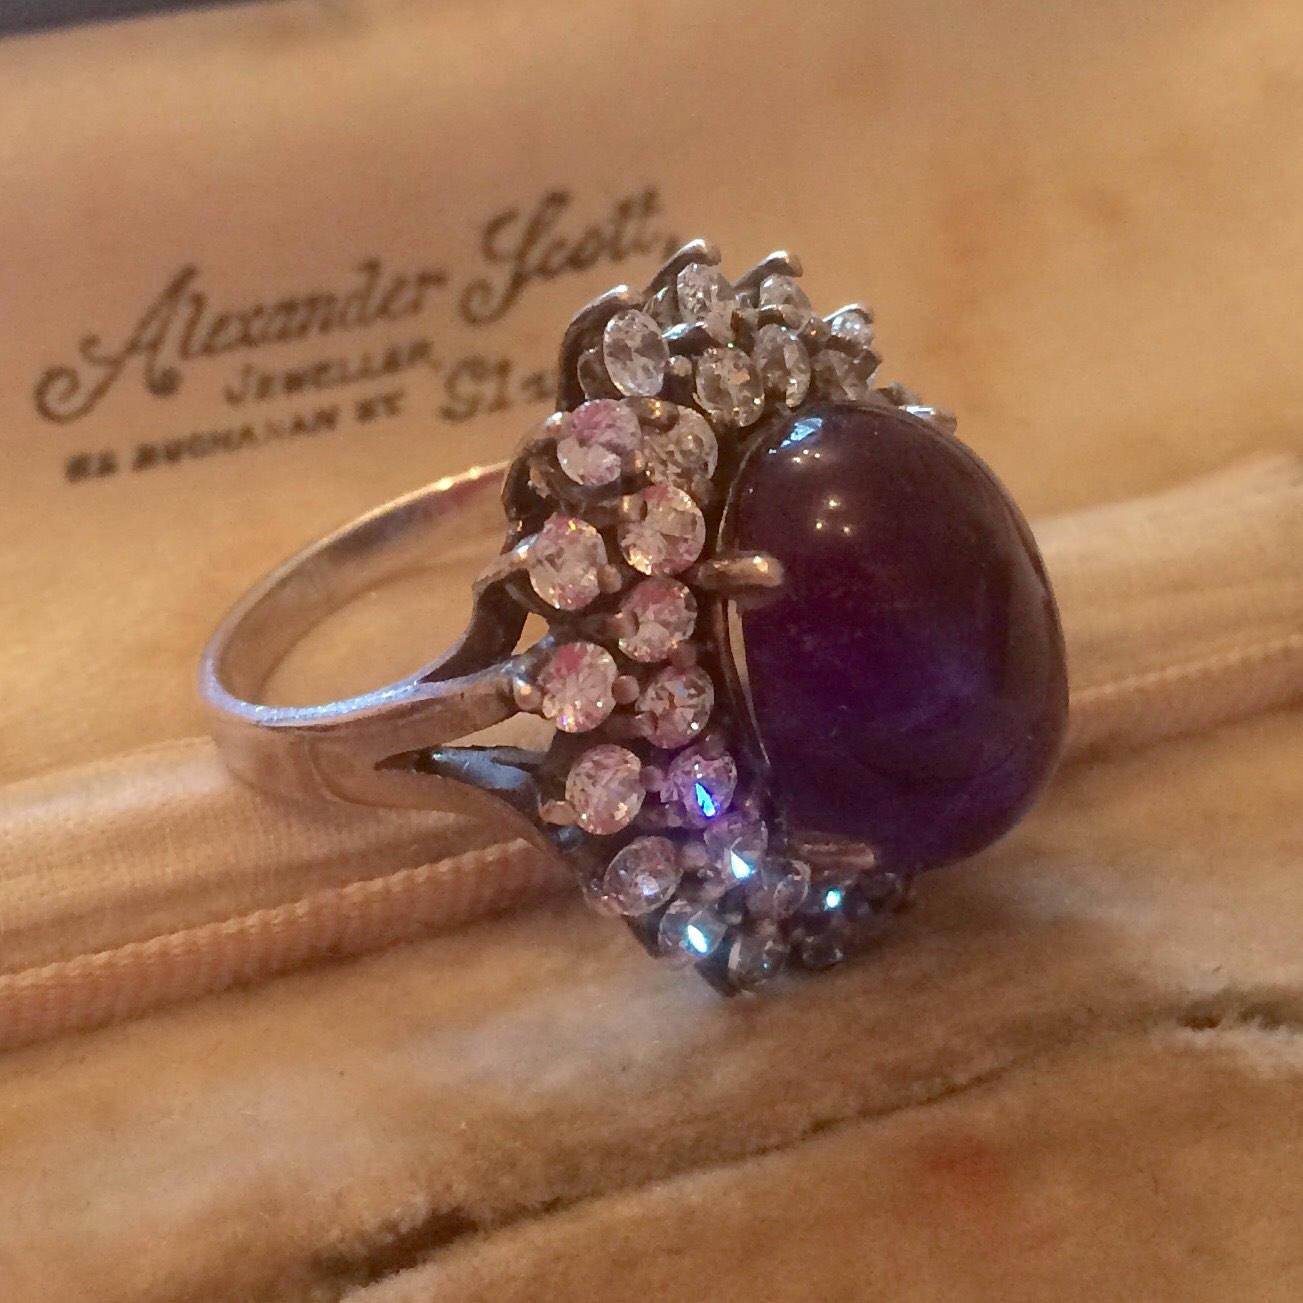 Vintage Amethyst Ring Vintage Silver Ring Vintage Ring Statement Ring Amethyst Jewellery Vintage Jewellery Vintage Jewelry Ring